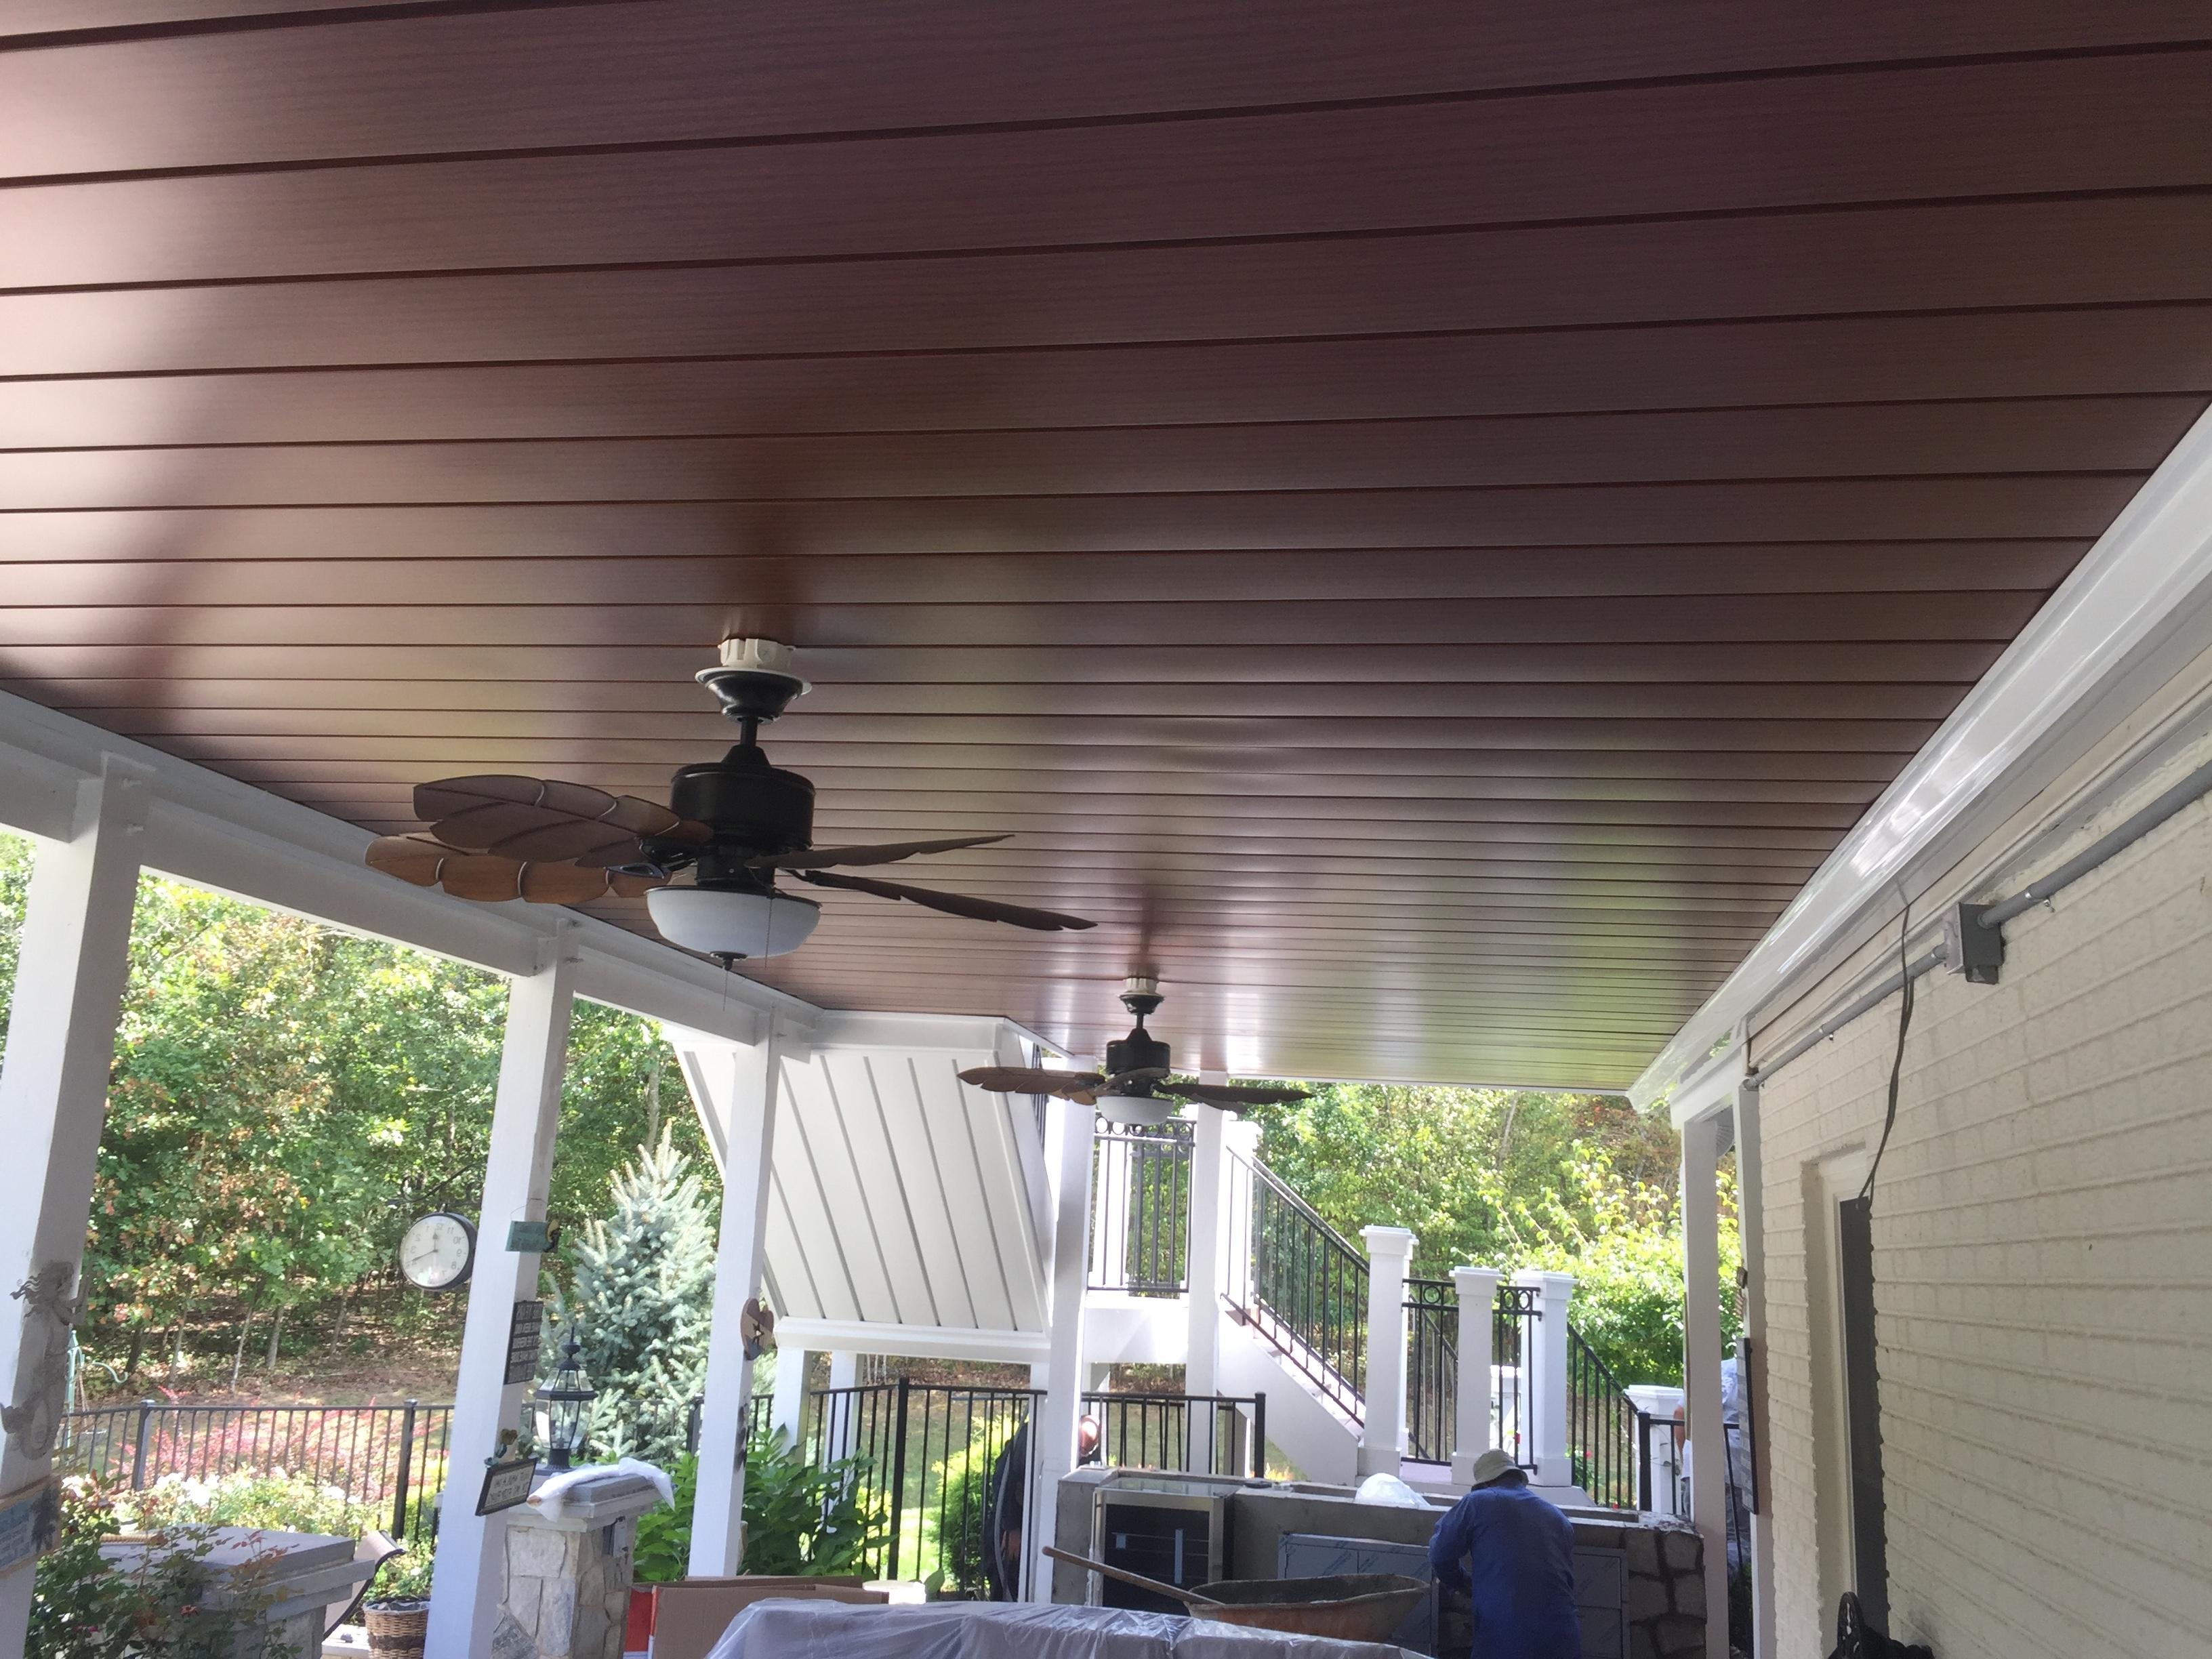 Most Recent Outdoor Ceiling Fan Under Deck With Install Outdoor Ceiling Fan Under Deck Www, Install Ceiling Fan (Gallery 1 of 20)